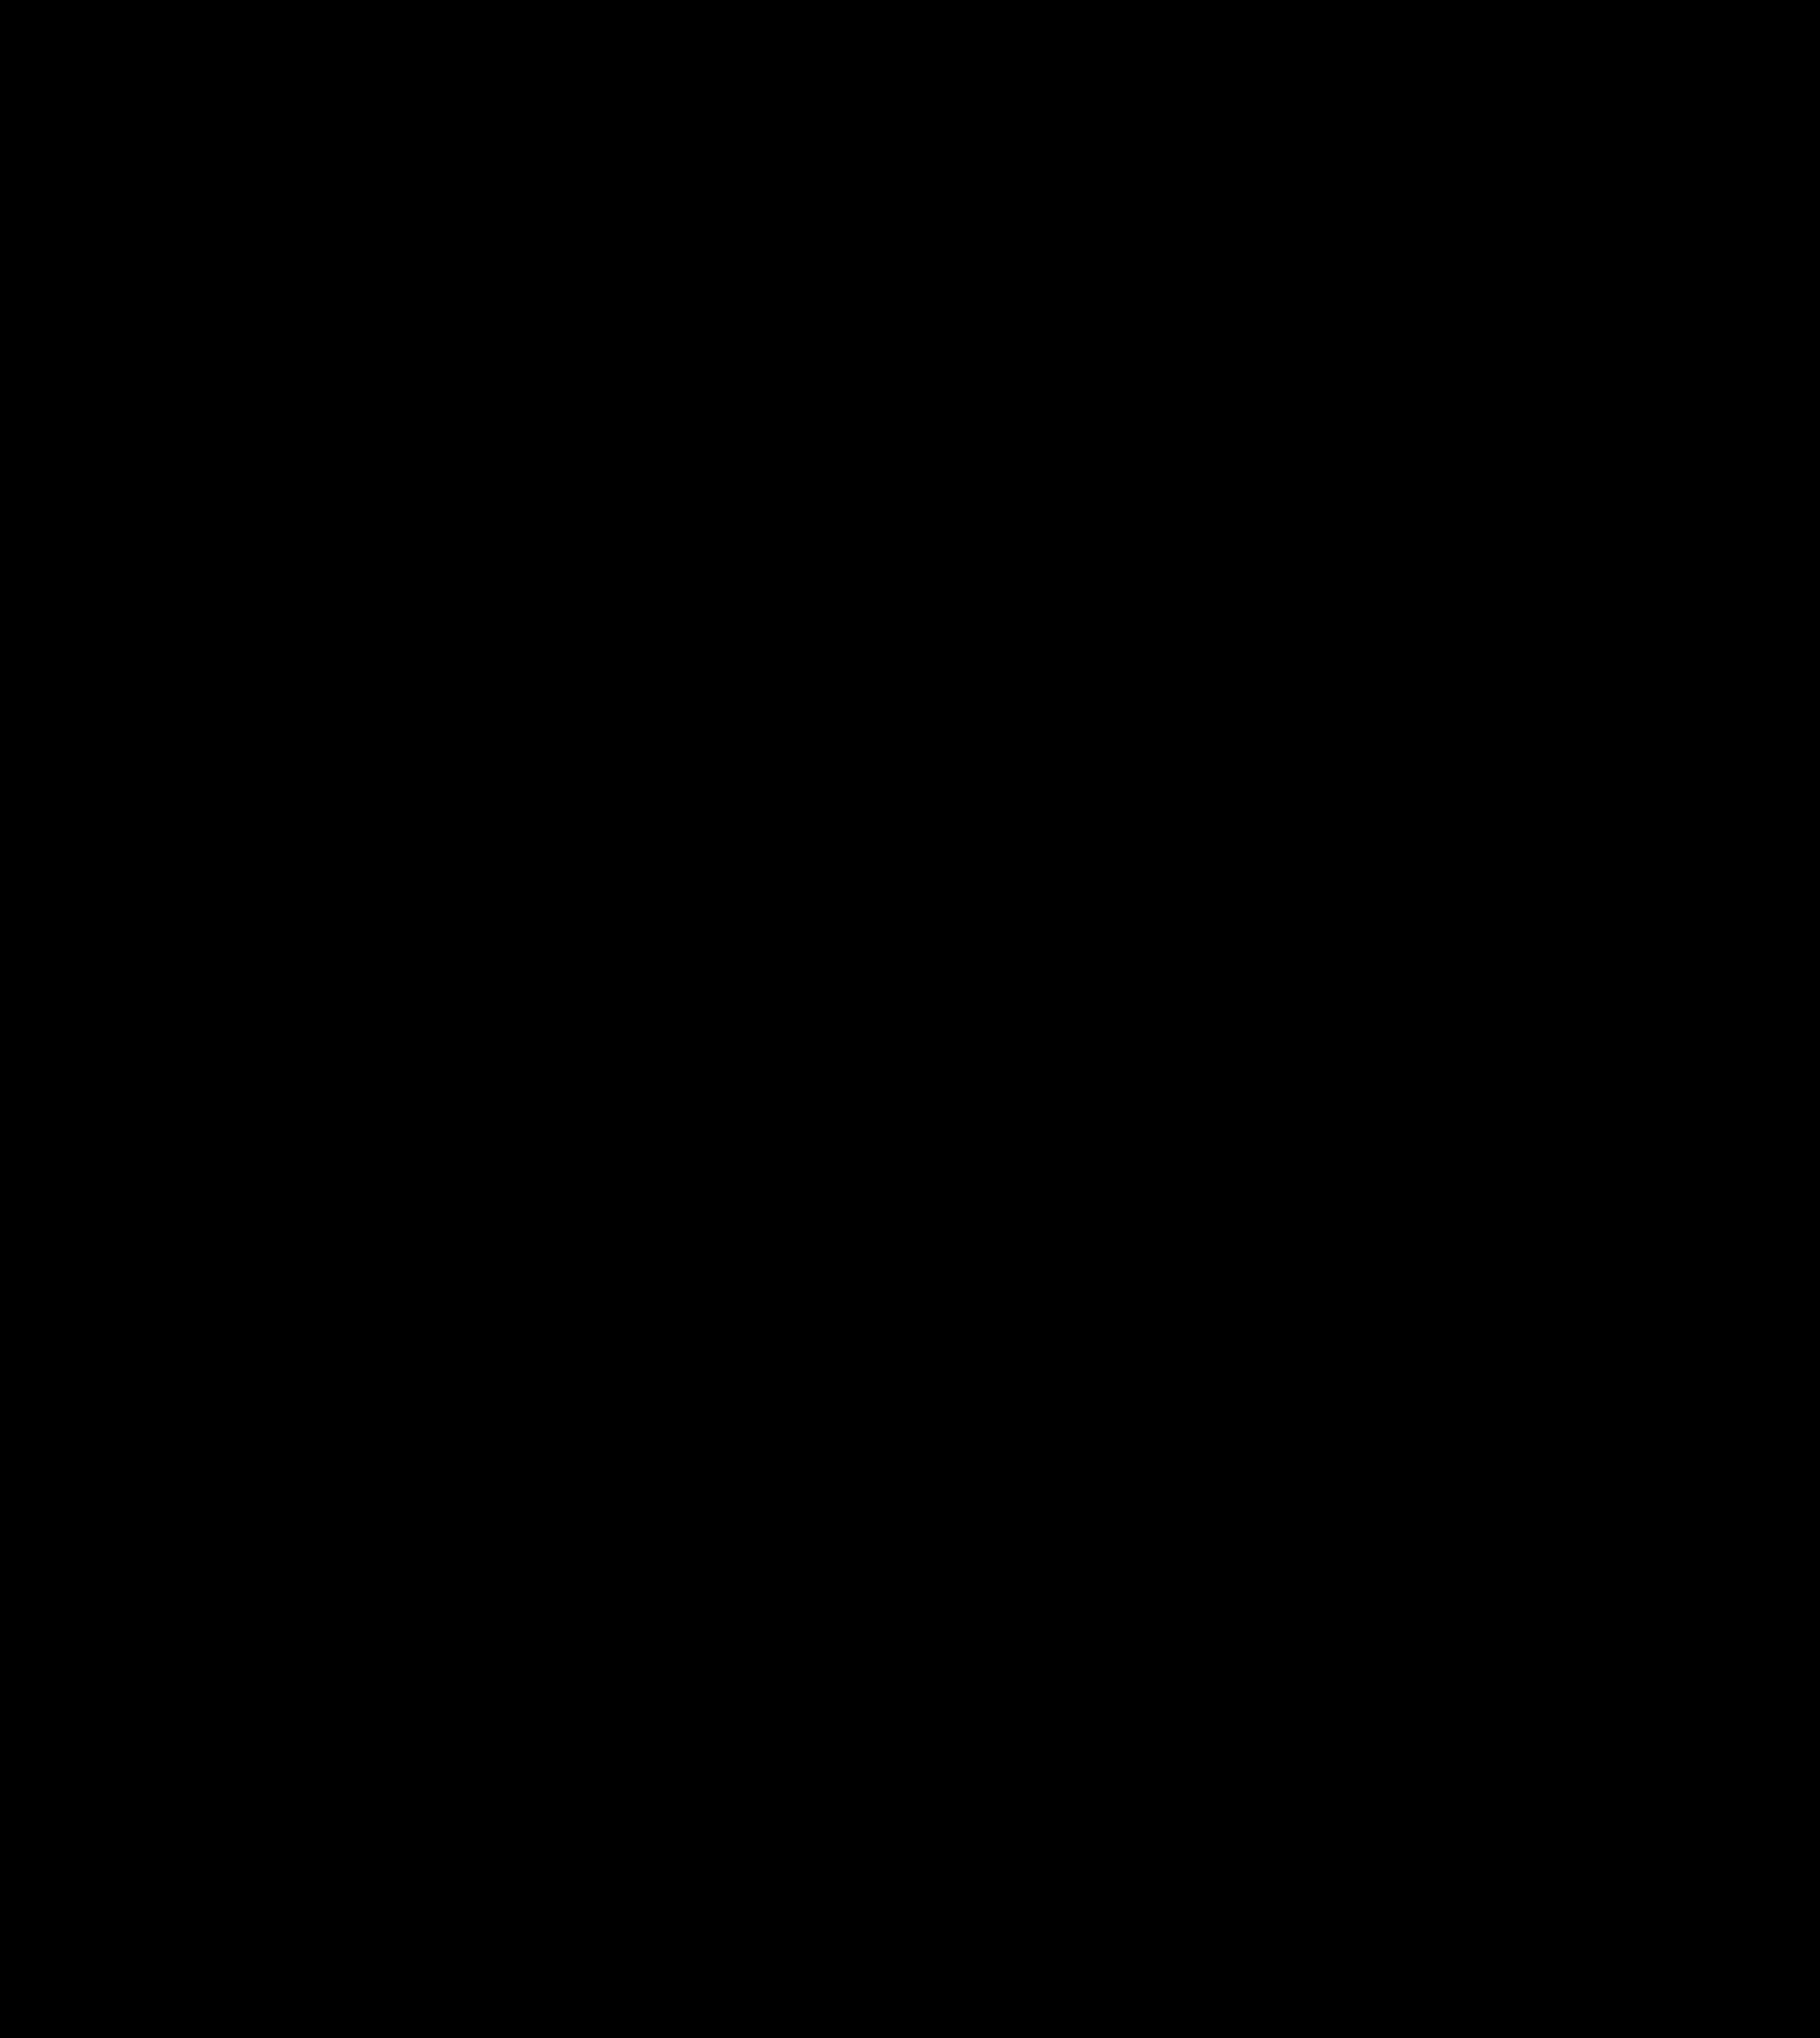 clipart - letter e